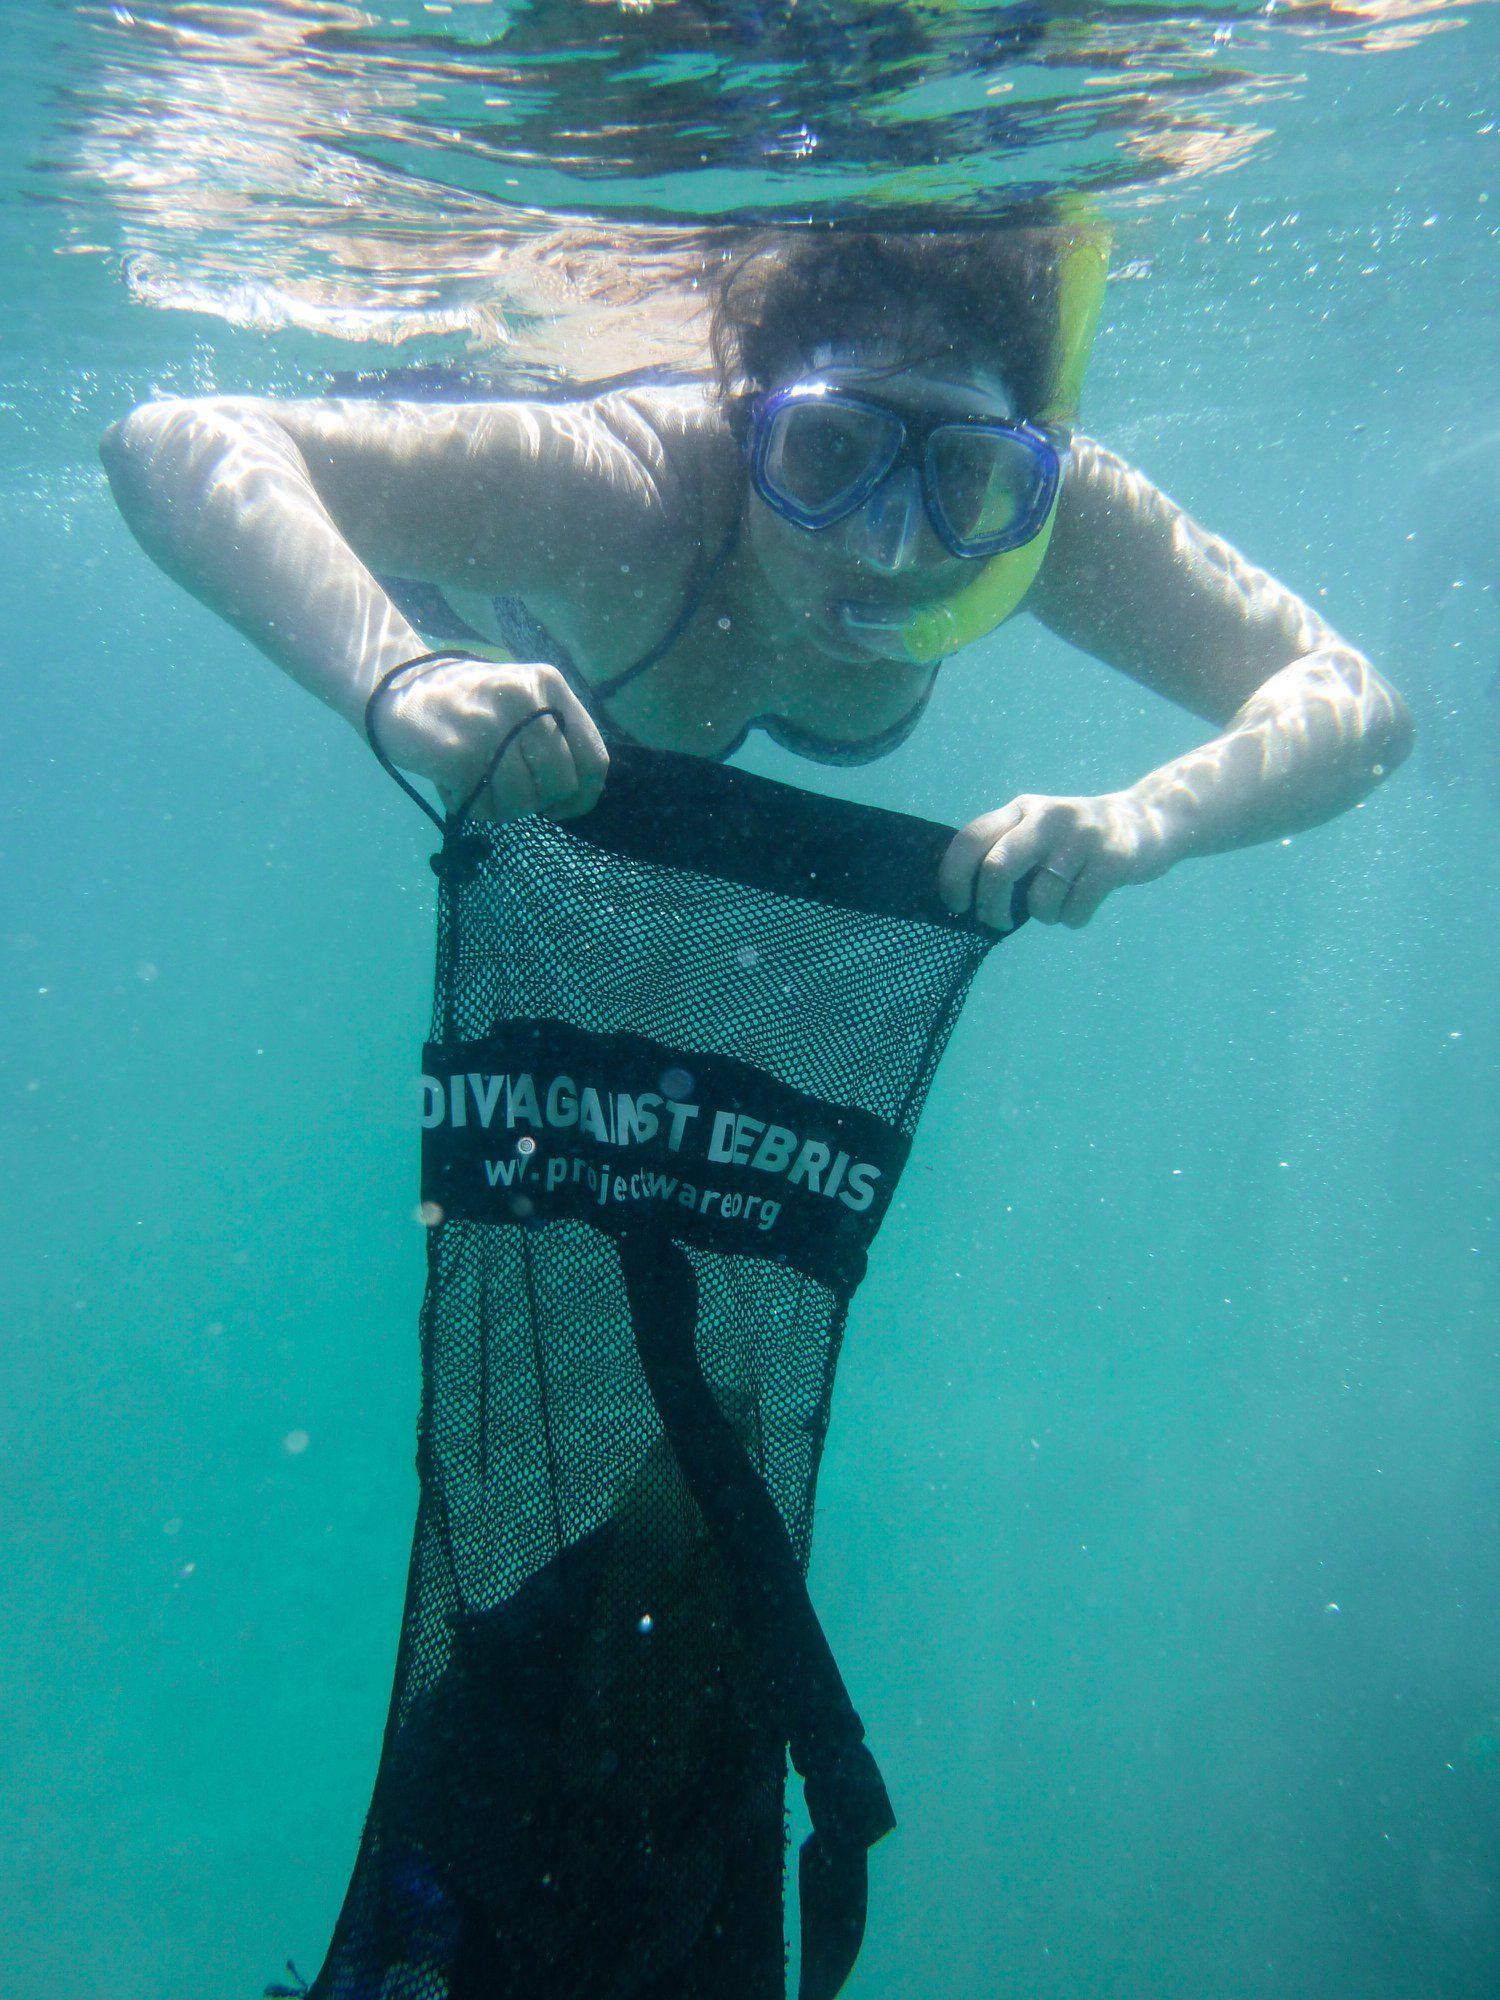 Volunteer With Coral Reefs Workingabroad Volunteer Marine Conservation Caribbean